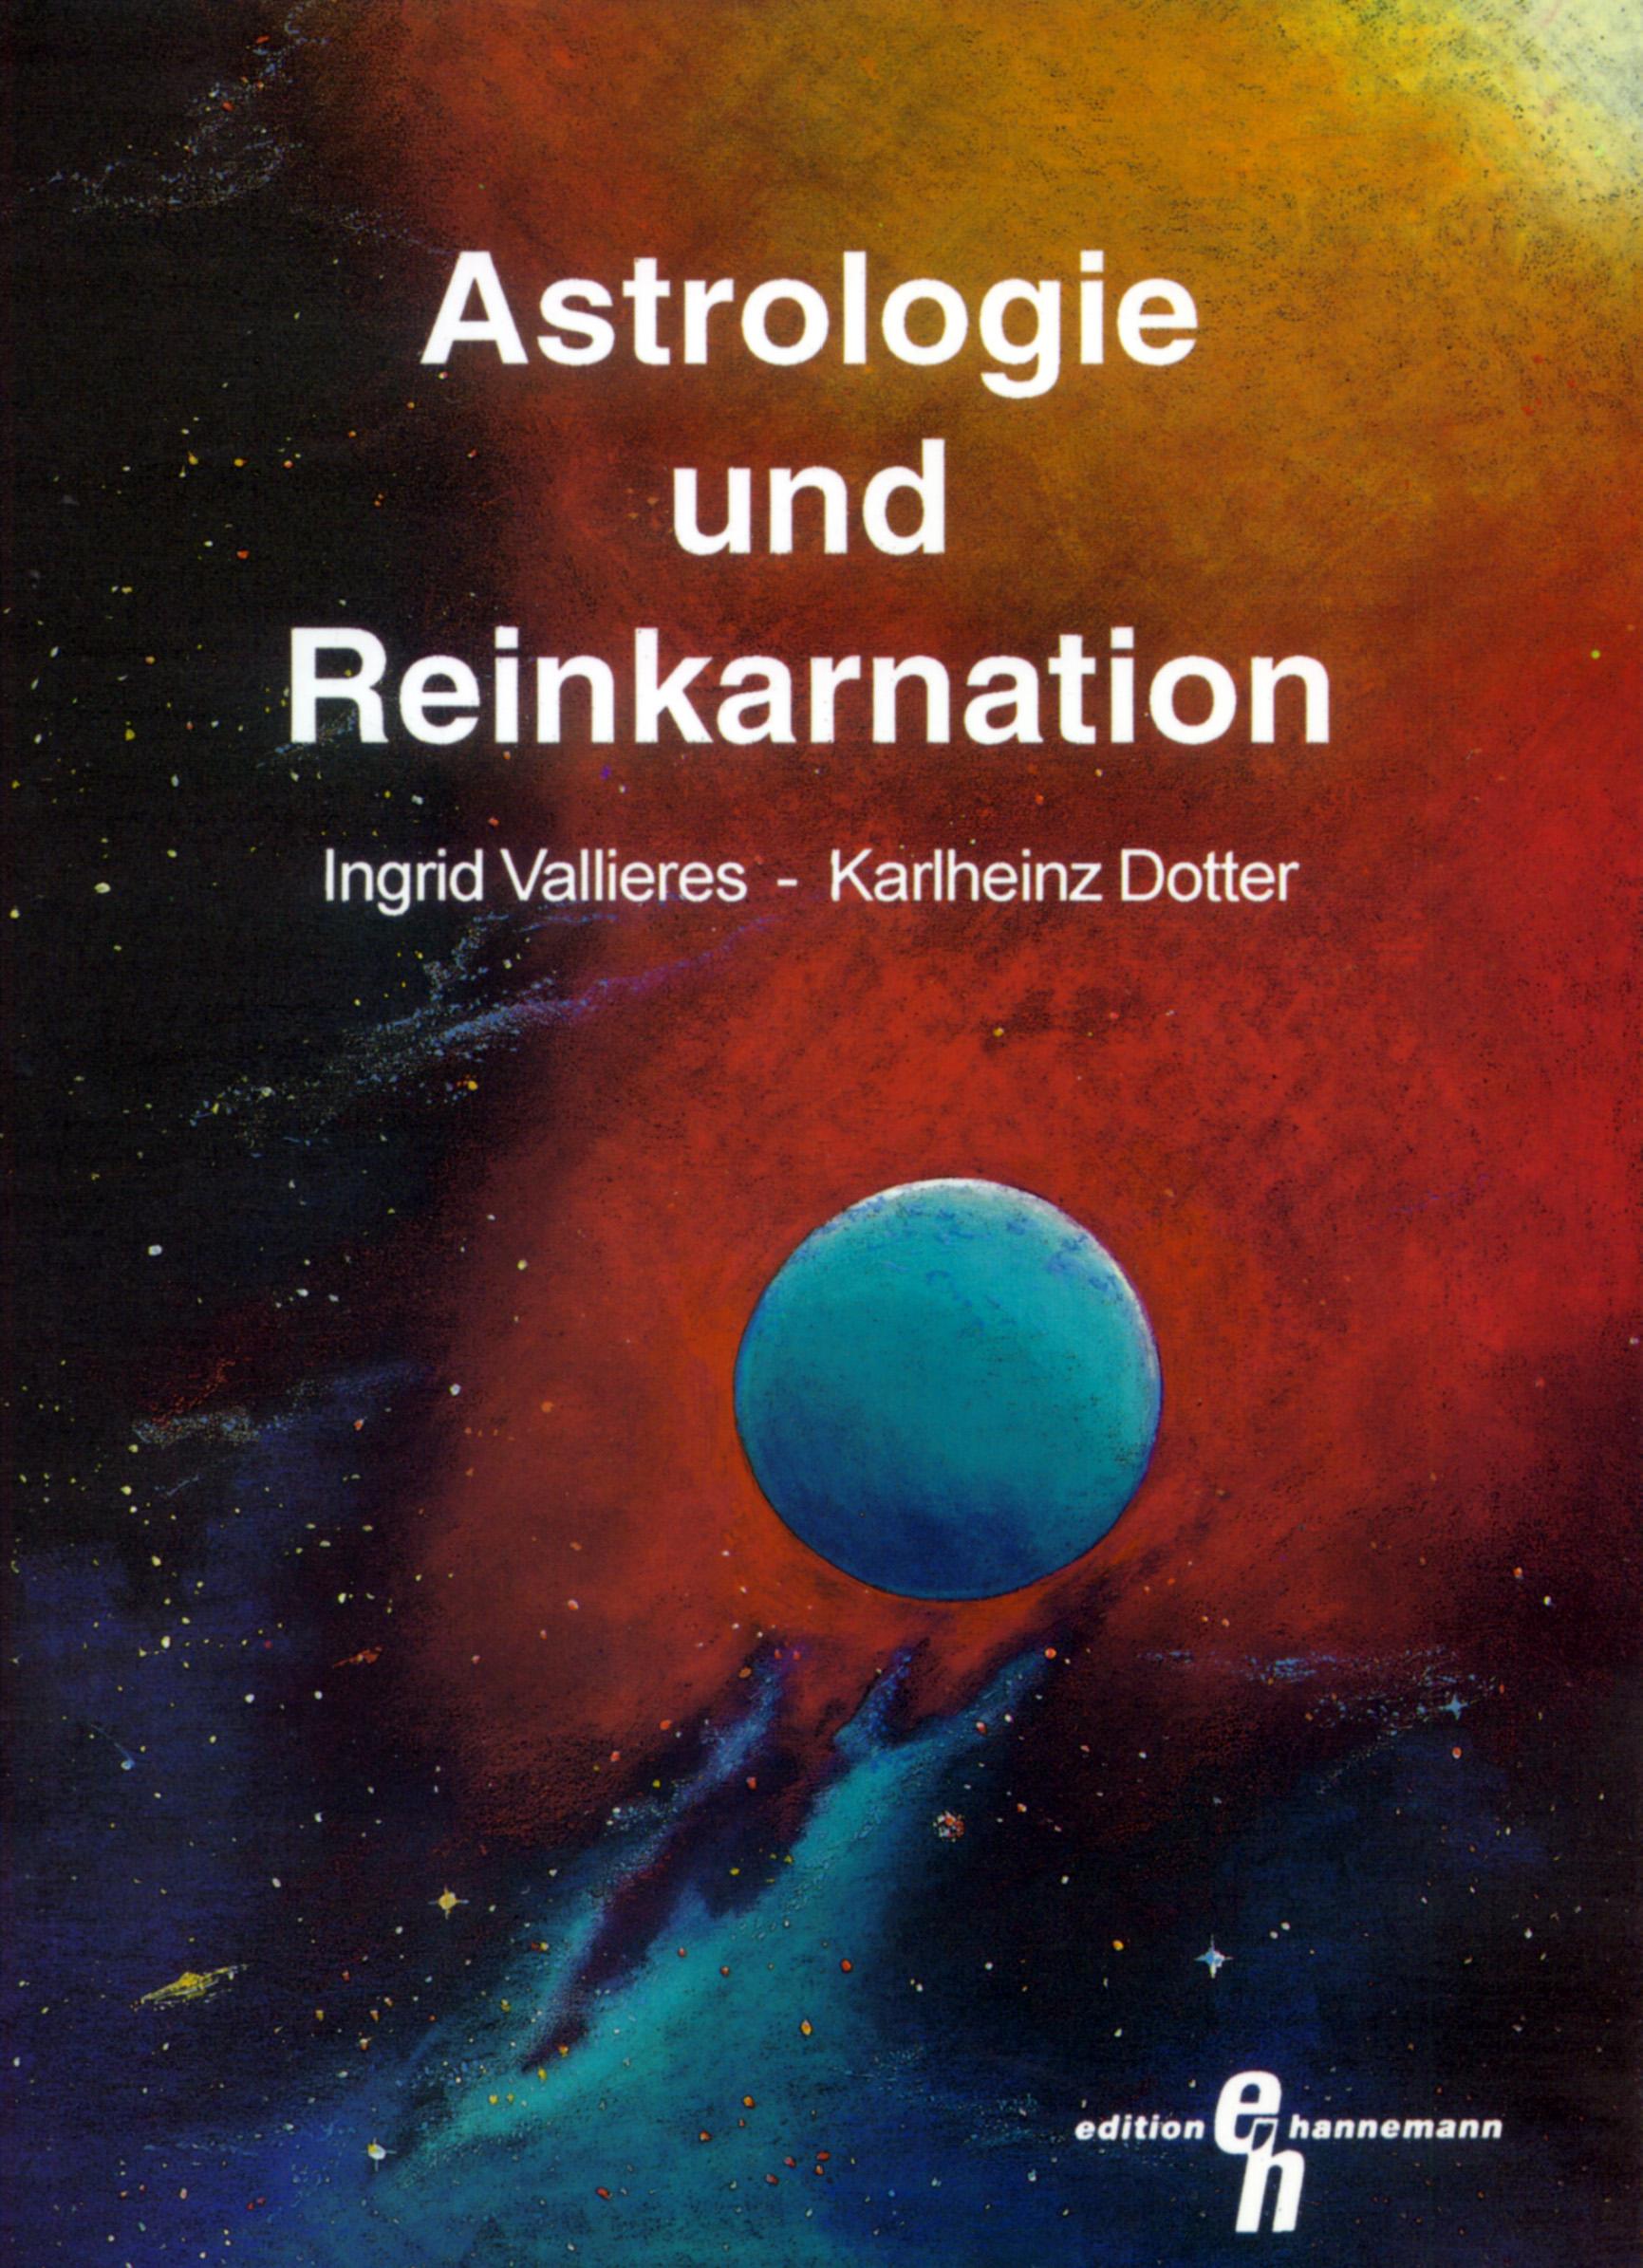 Astrologie & Reinkarnation